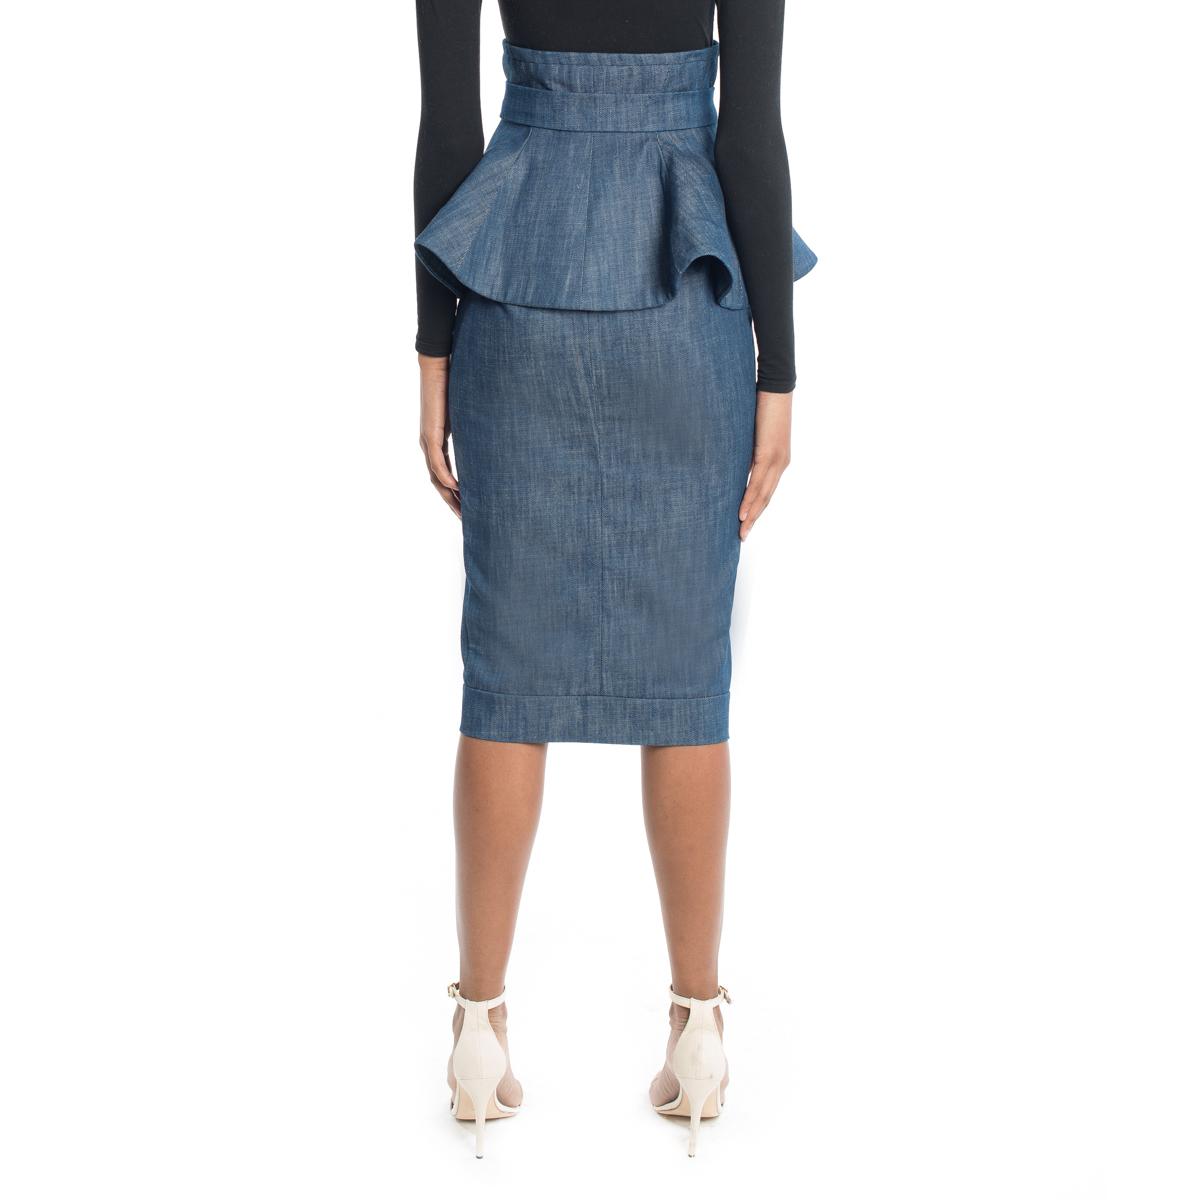 Cleopatra Peplum Pencil Skirt